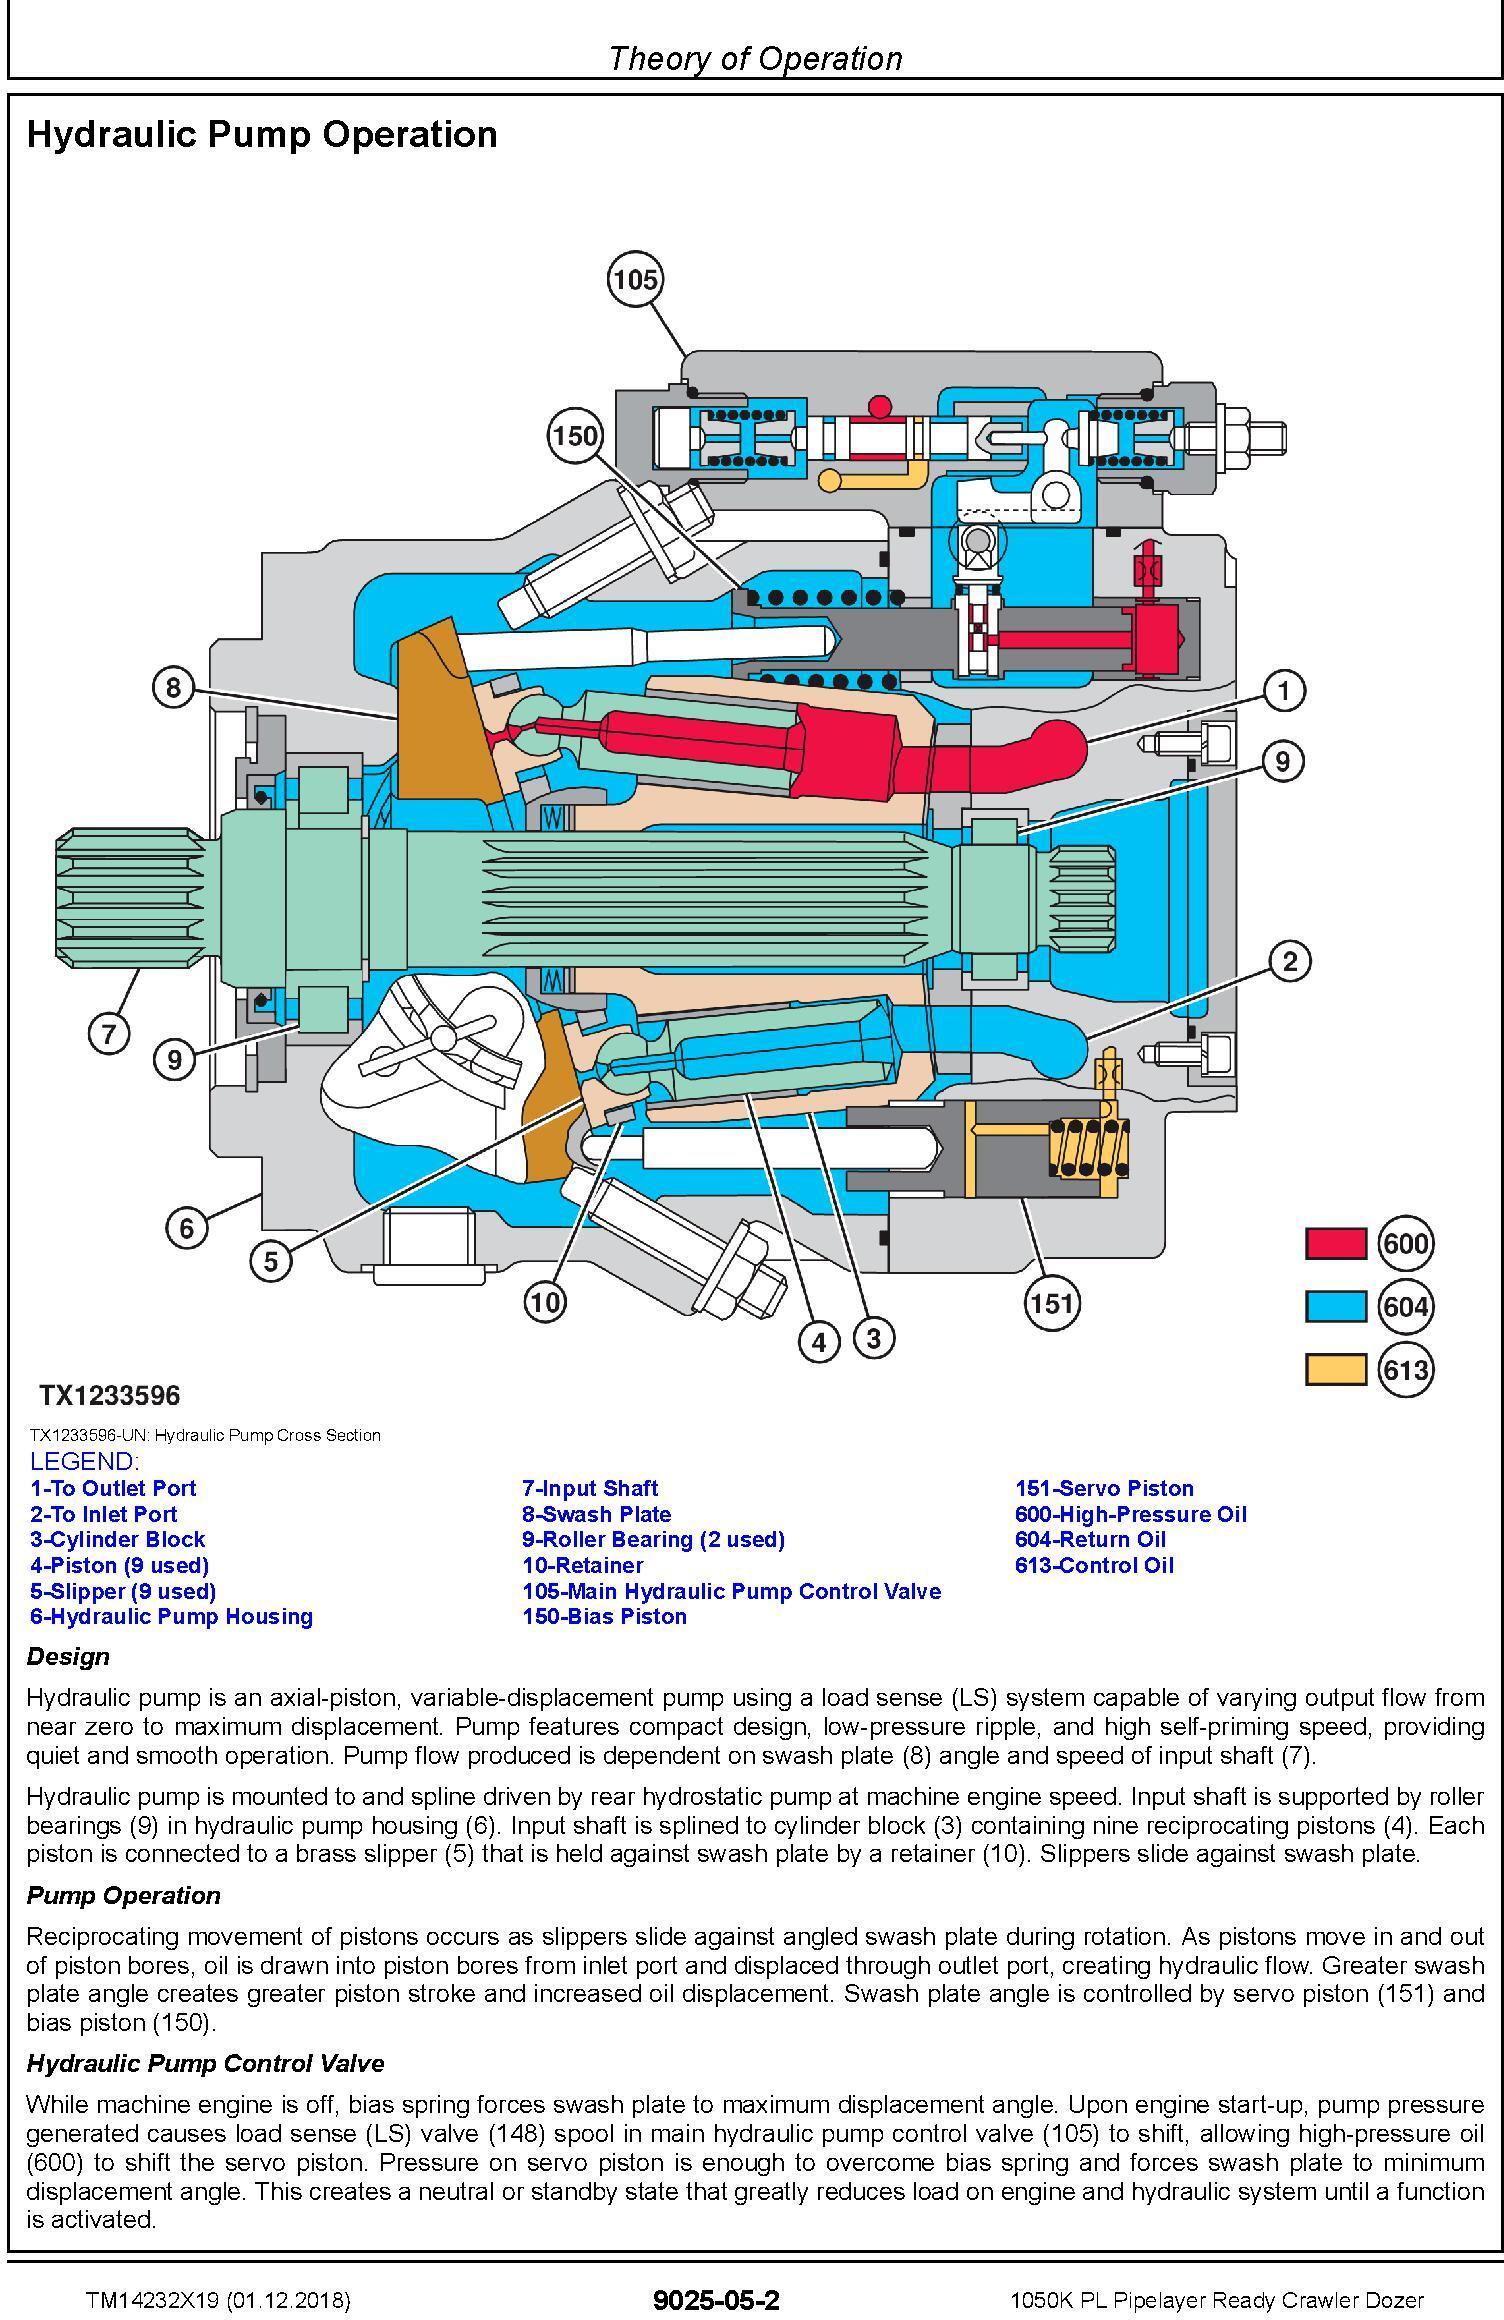 John Deere 1050K PL (SN.F310922-318801) Pipelayer Ready Crawler Dozer Diagnostic Manual (TM14232X19) - 2